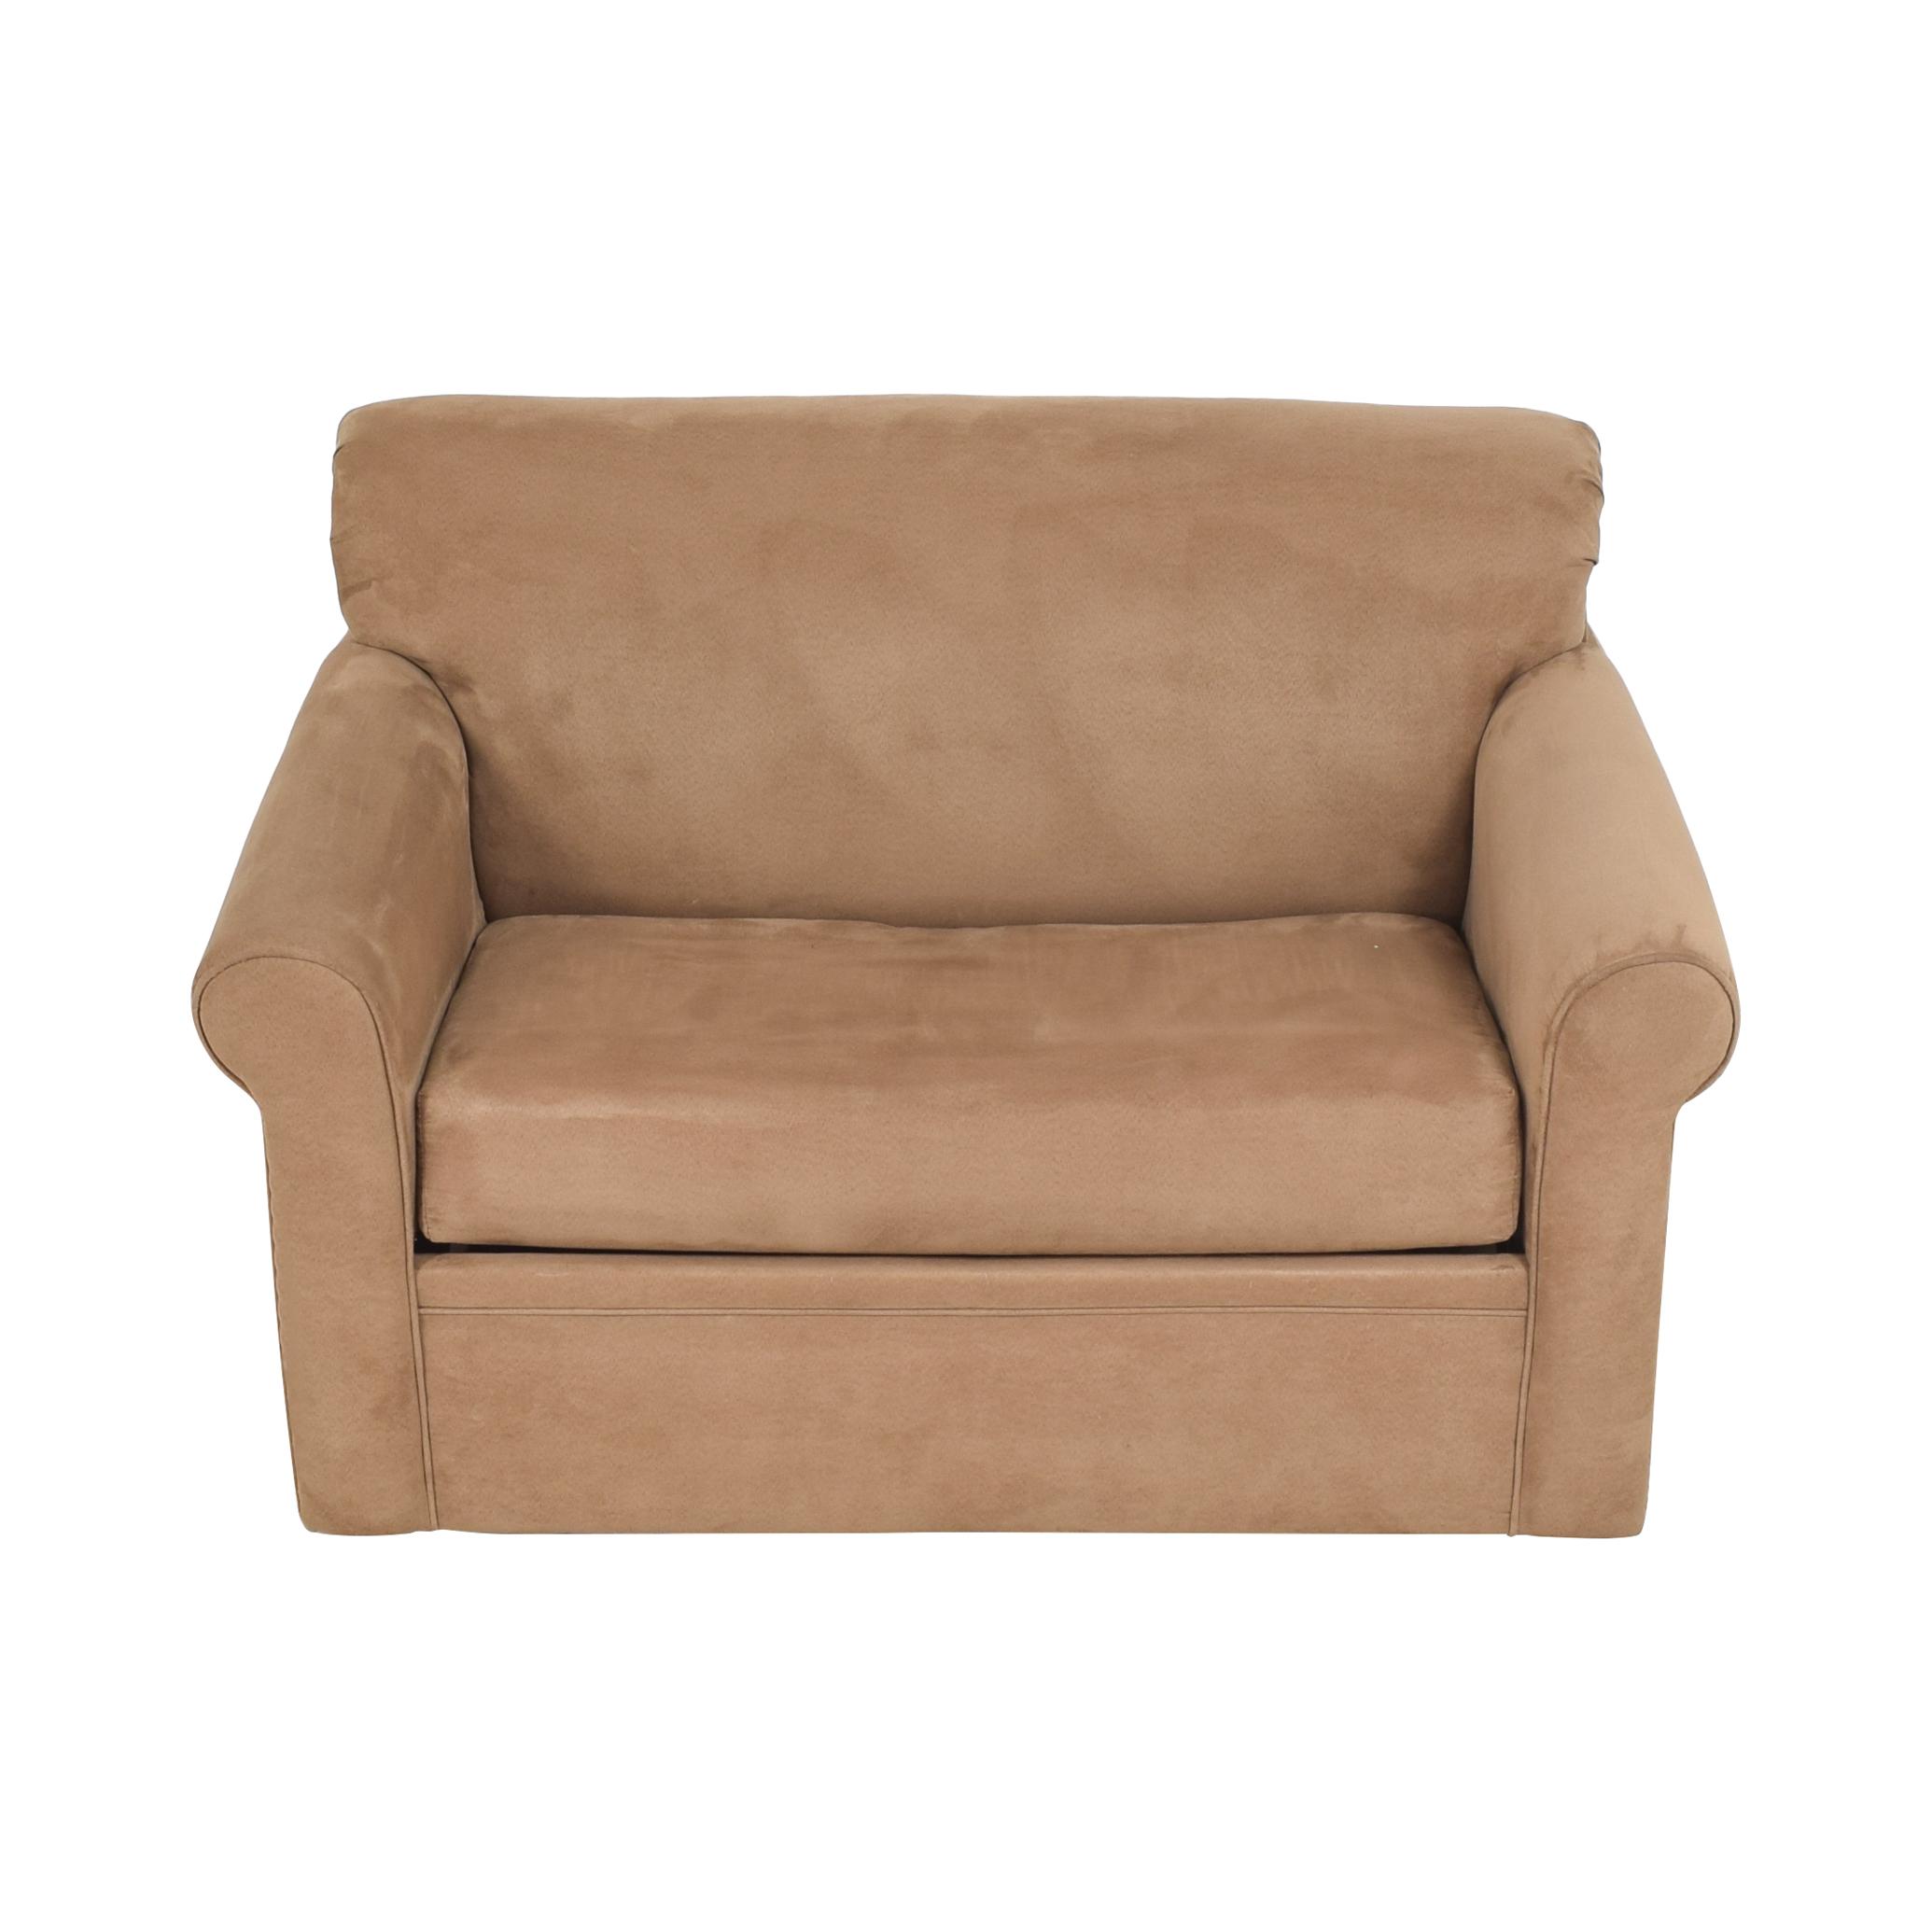 Overnight Sofa Overnight Sofa Sleeper Chair tan